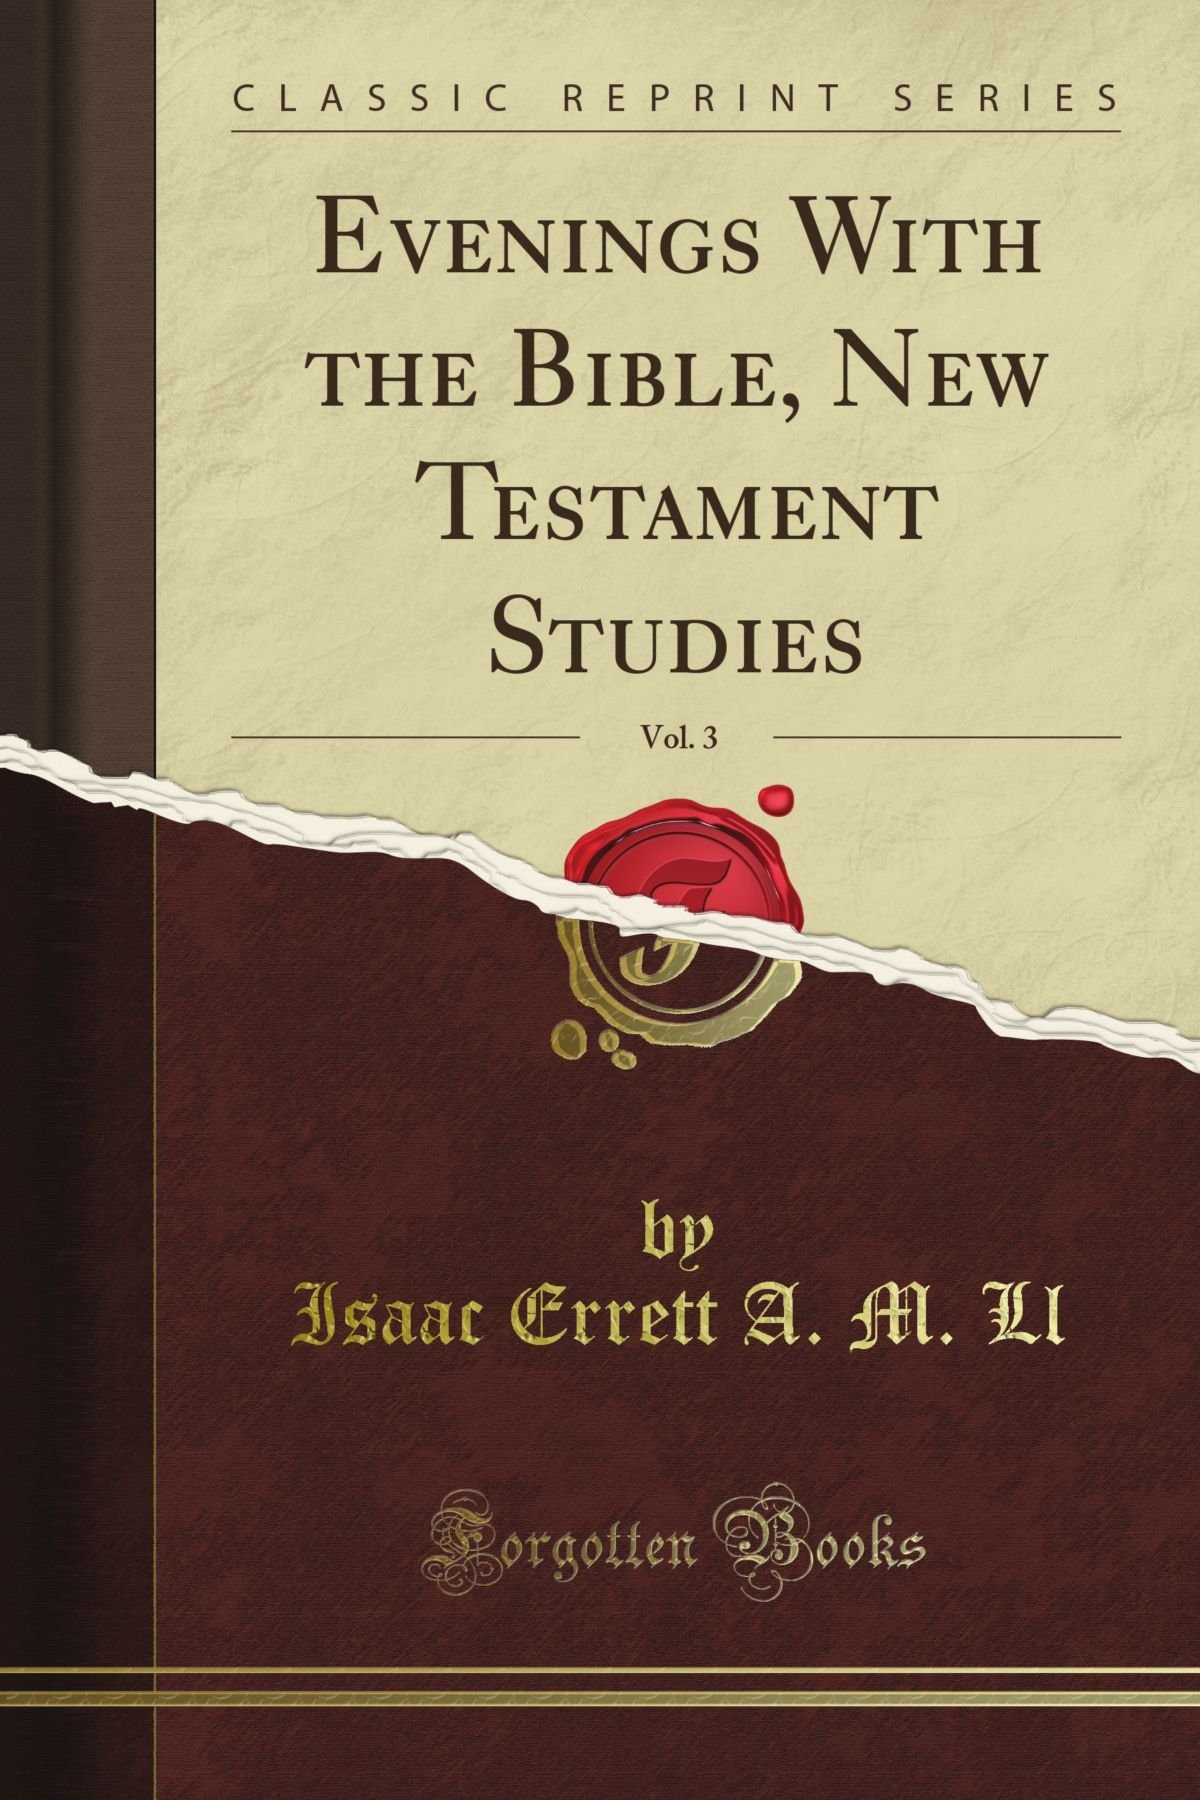 Evenings With the Bible, New Testament Studies, Vol. 3 (Classic Reprint) ebook